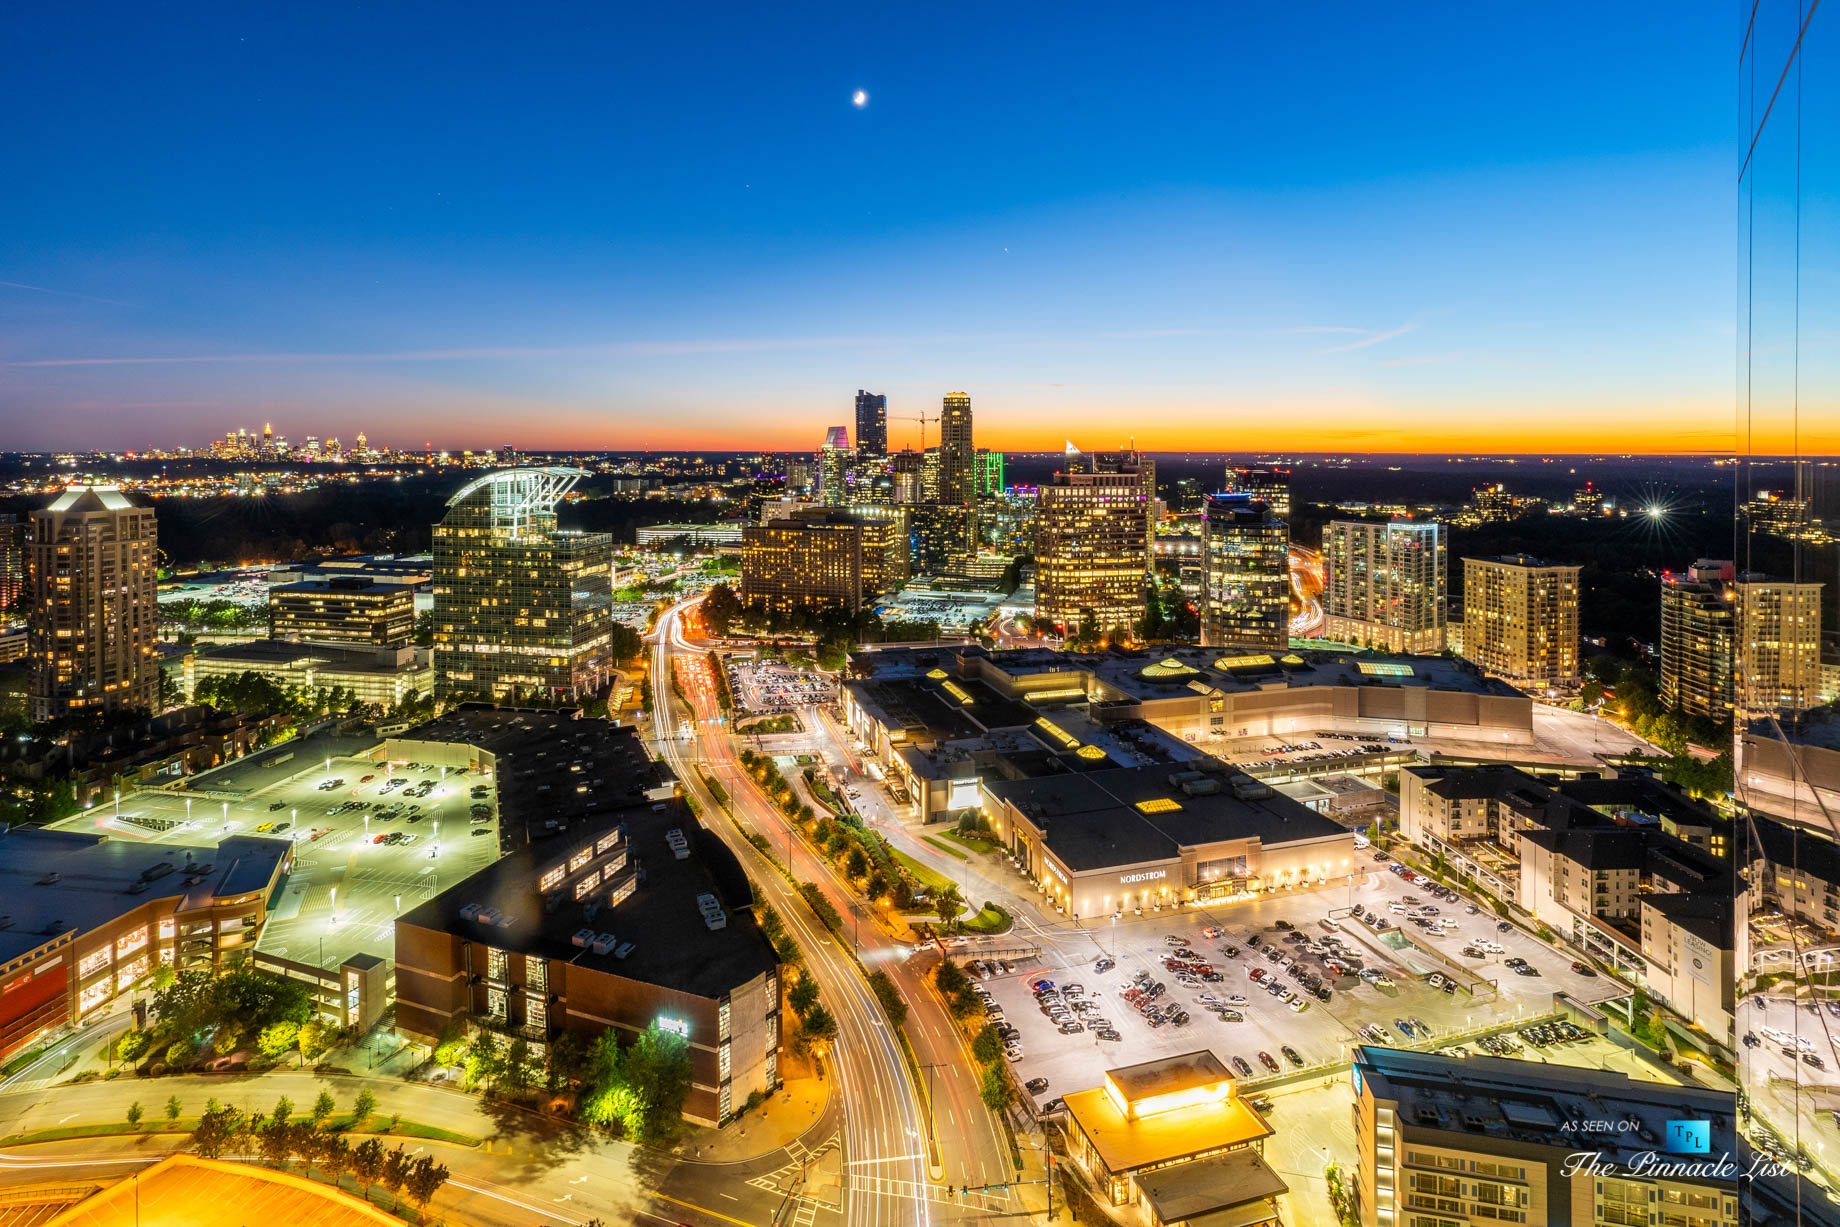 3630 Peachtree Rd NE, Unit 2808, Atlanta, GA, USA – Condo Exterior Night View – Luxury Real Estate – The Ritz-Carlton Residences Buckhead